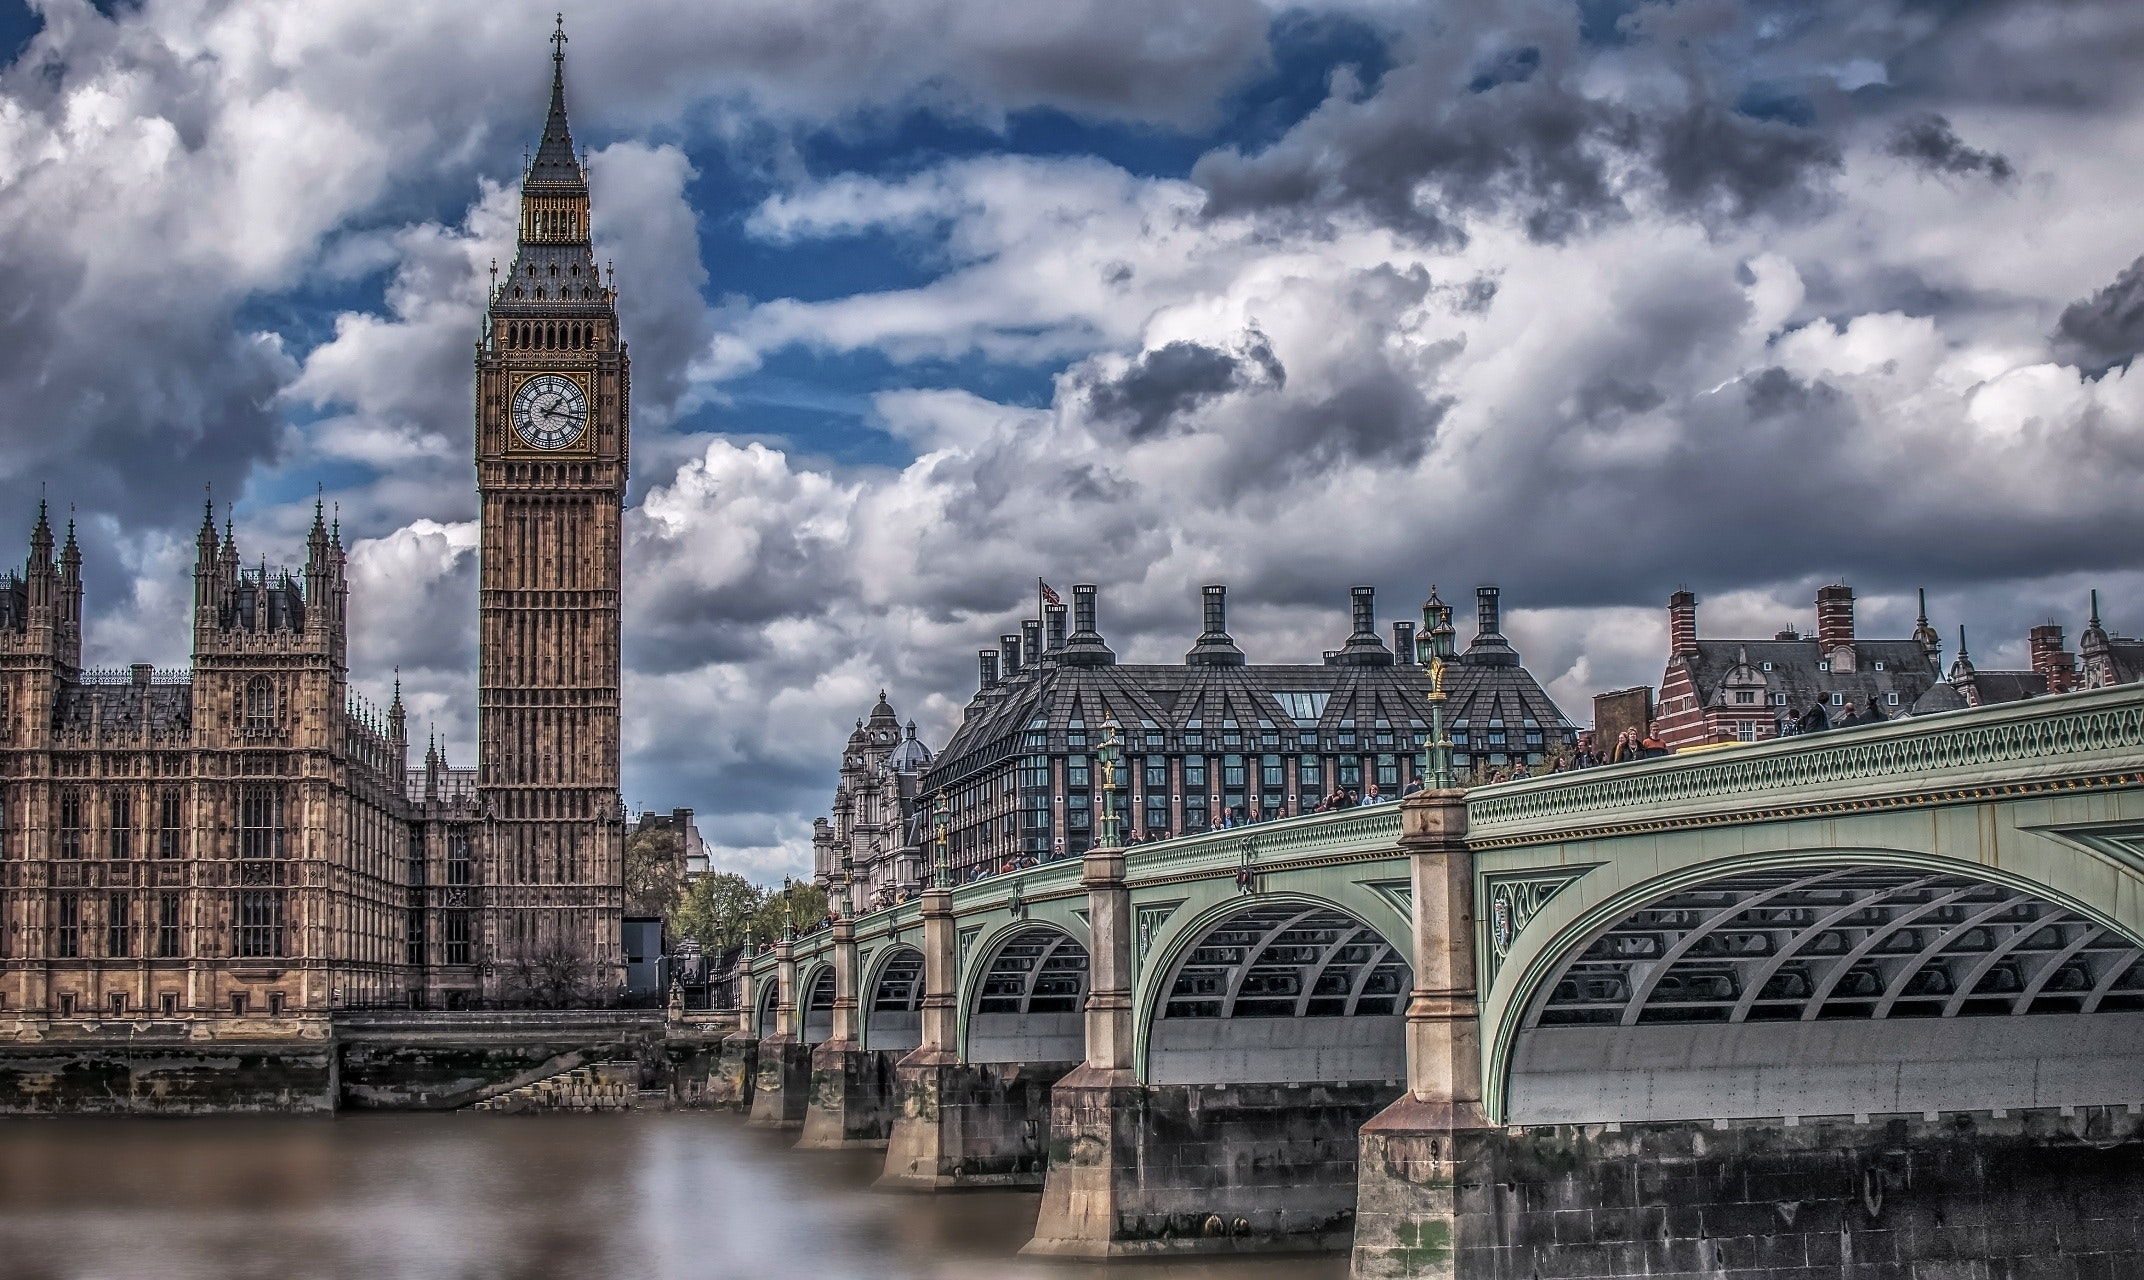 architecture-big-ben-bridge-262413.jpg